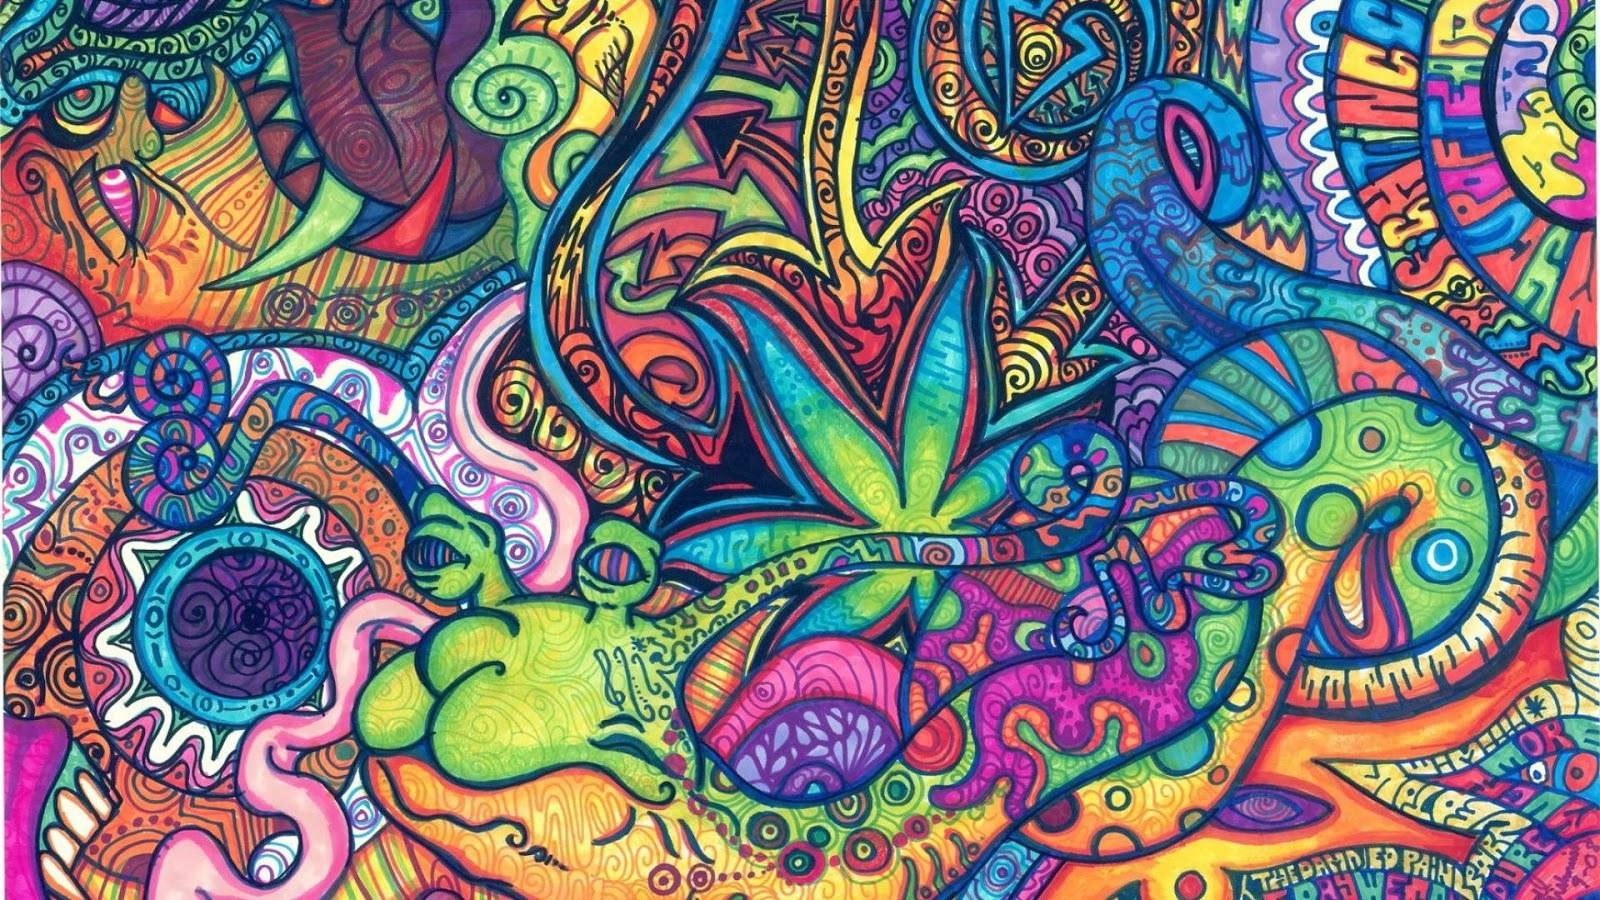 Live Wallpaper 10 Screenshot 3 Psychedelic 4